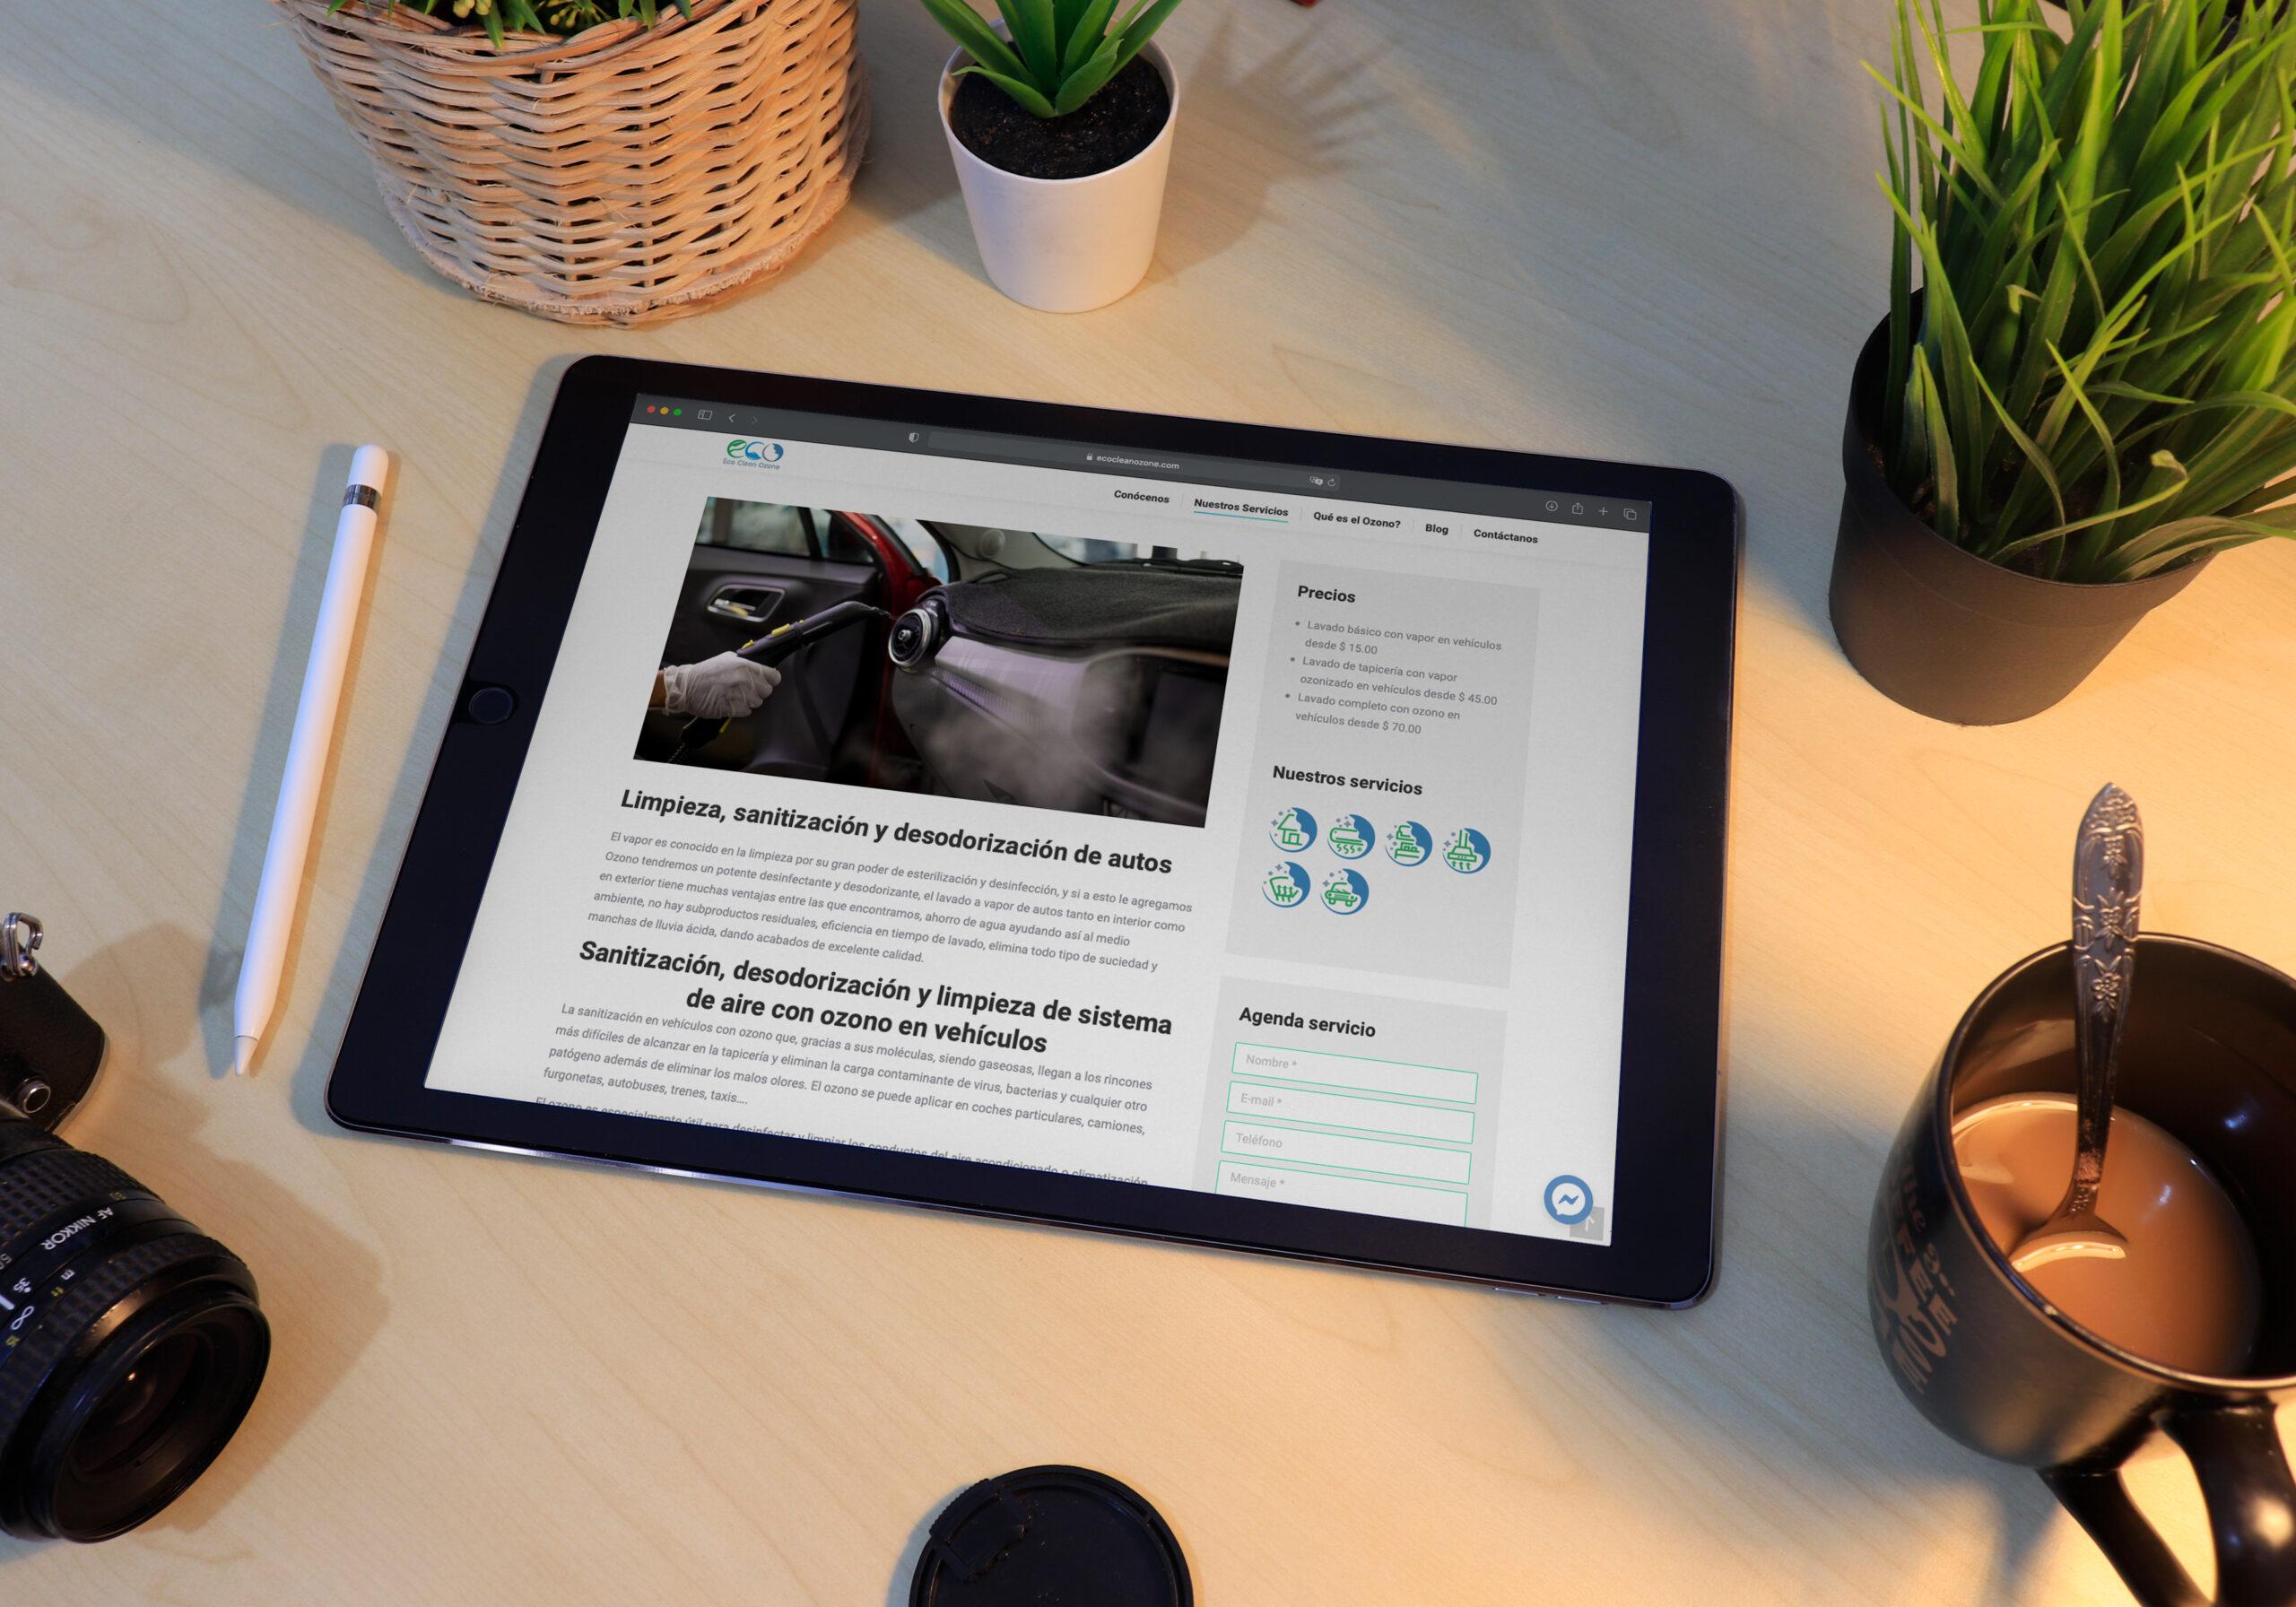 Ipad Pro 2017 12,9 inch – Mockup 1